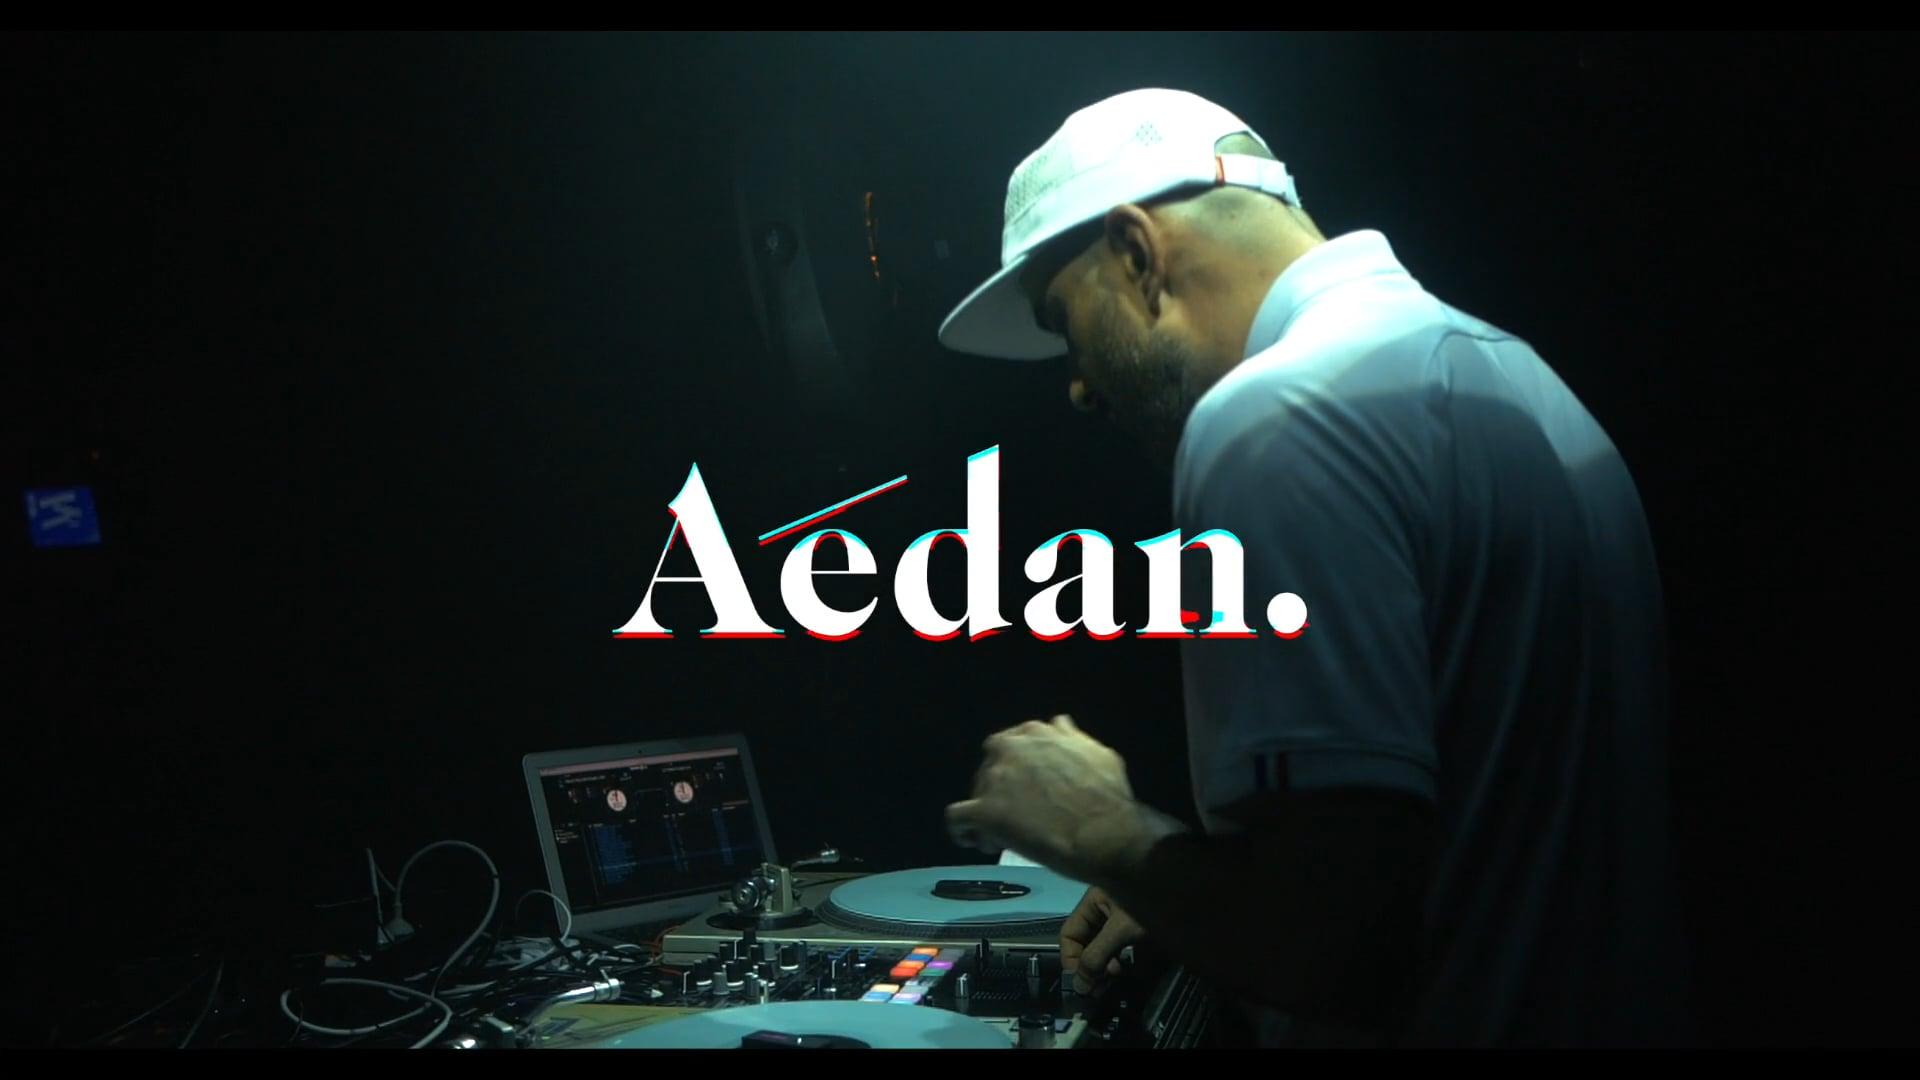 Aedan - MaMa Festival 2019 (Paris)